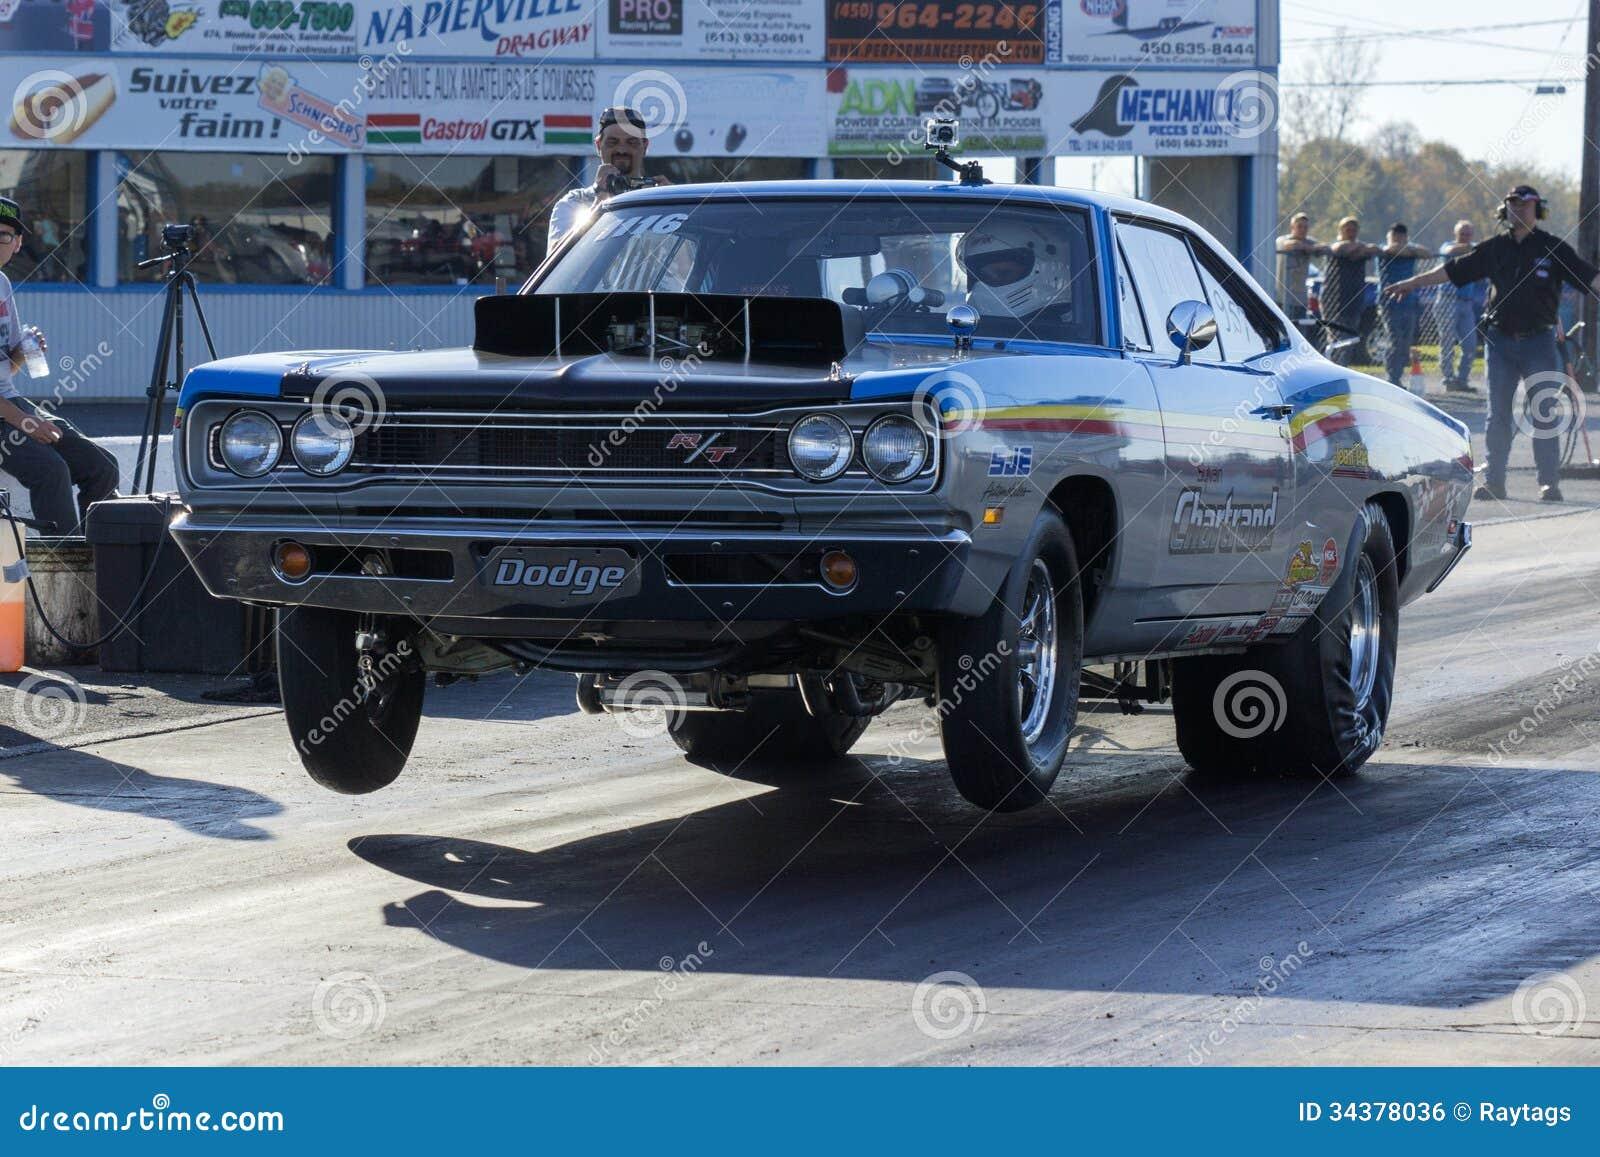 Drag car wheelie editorial photo. Image of motor, race - 34378036